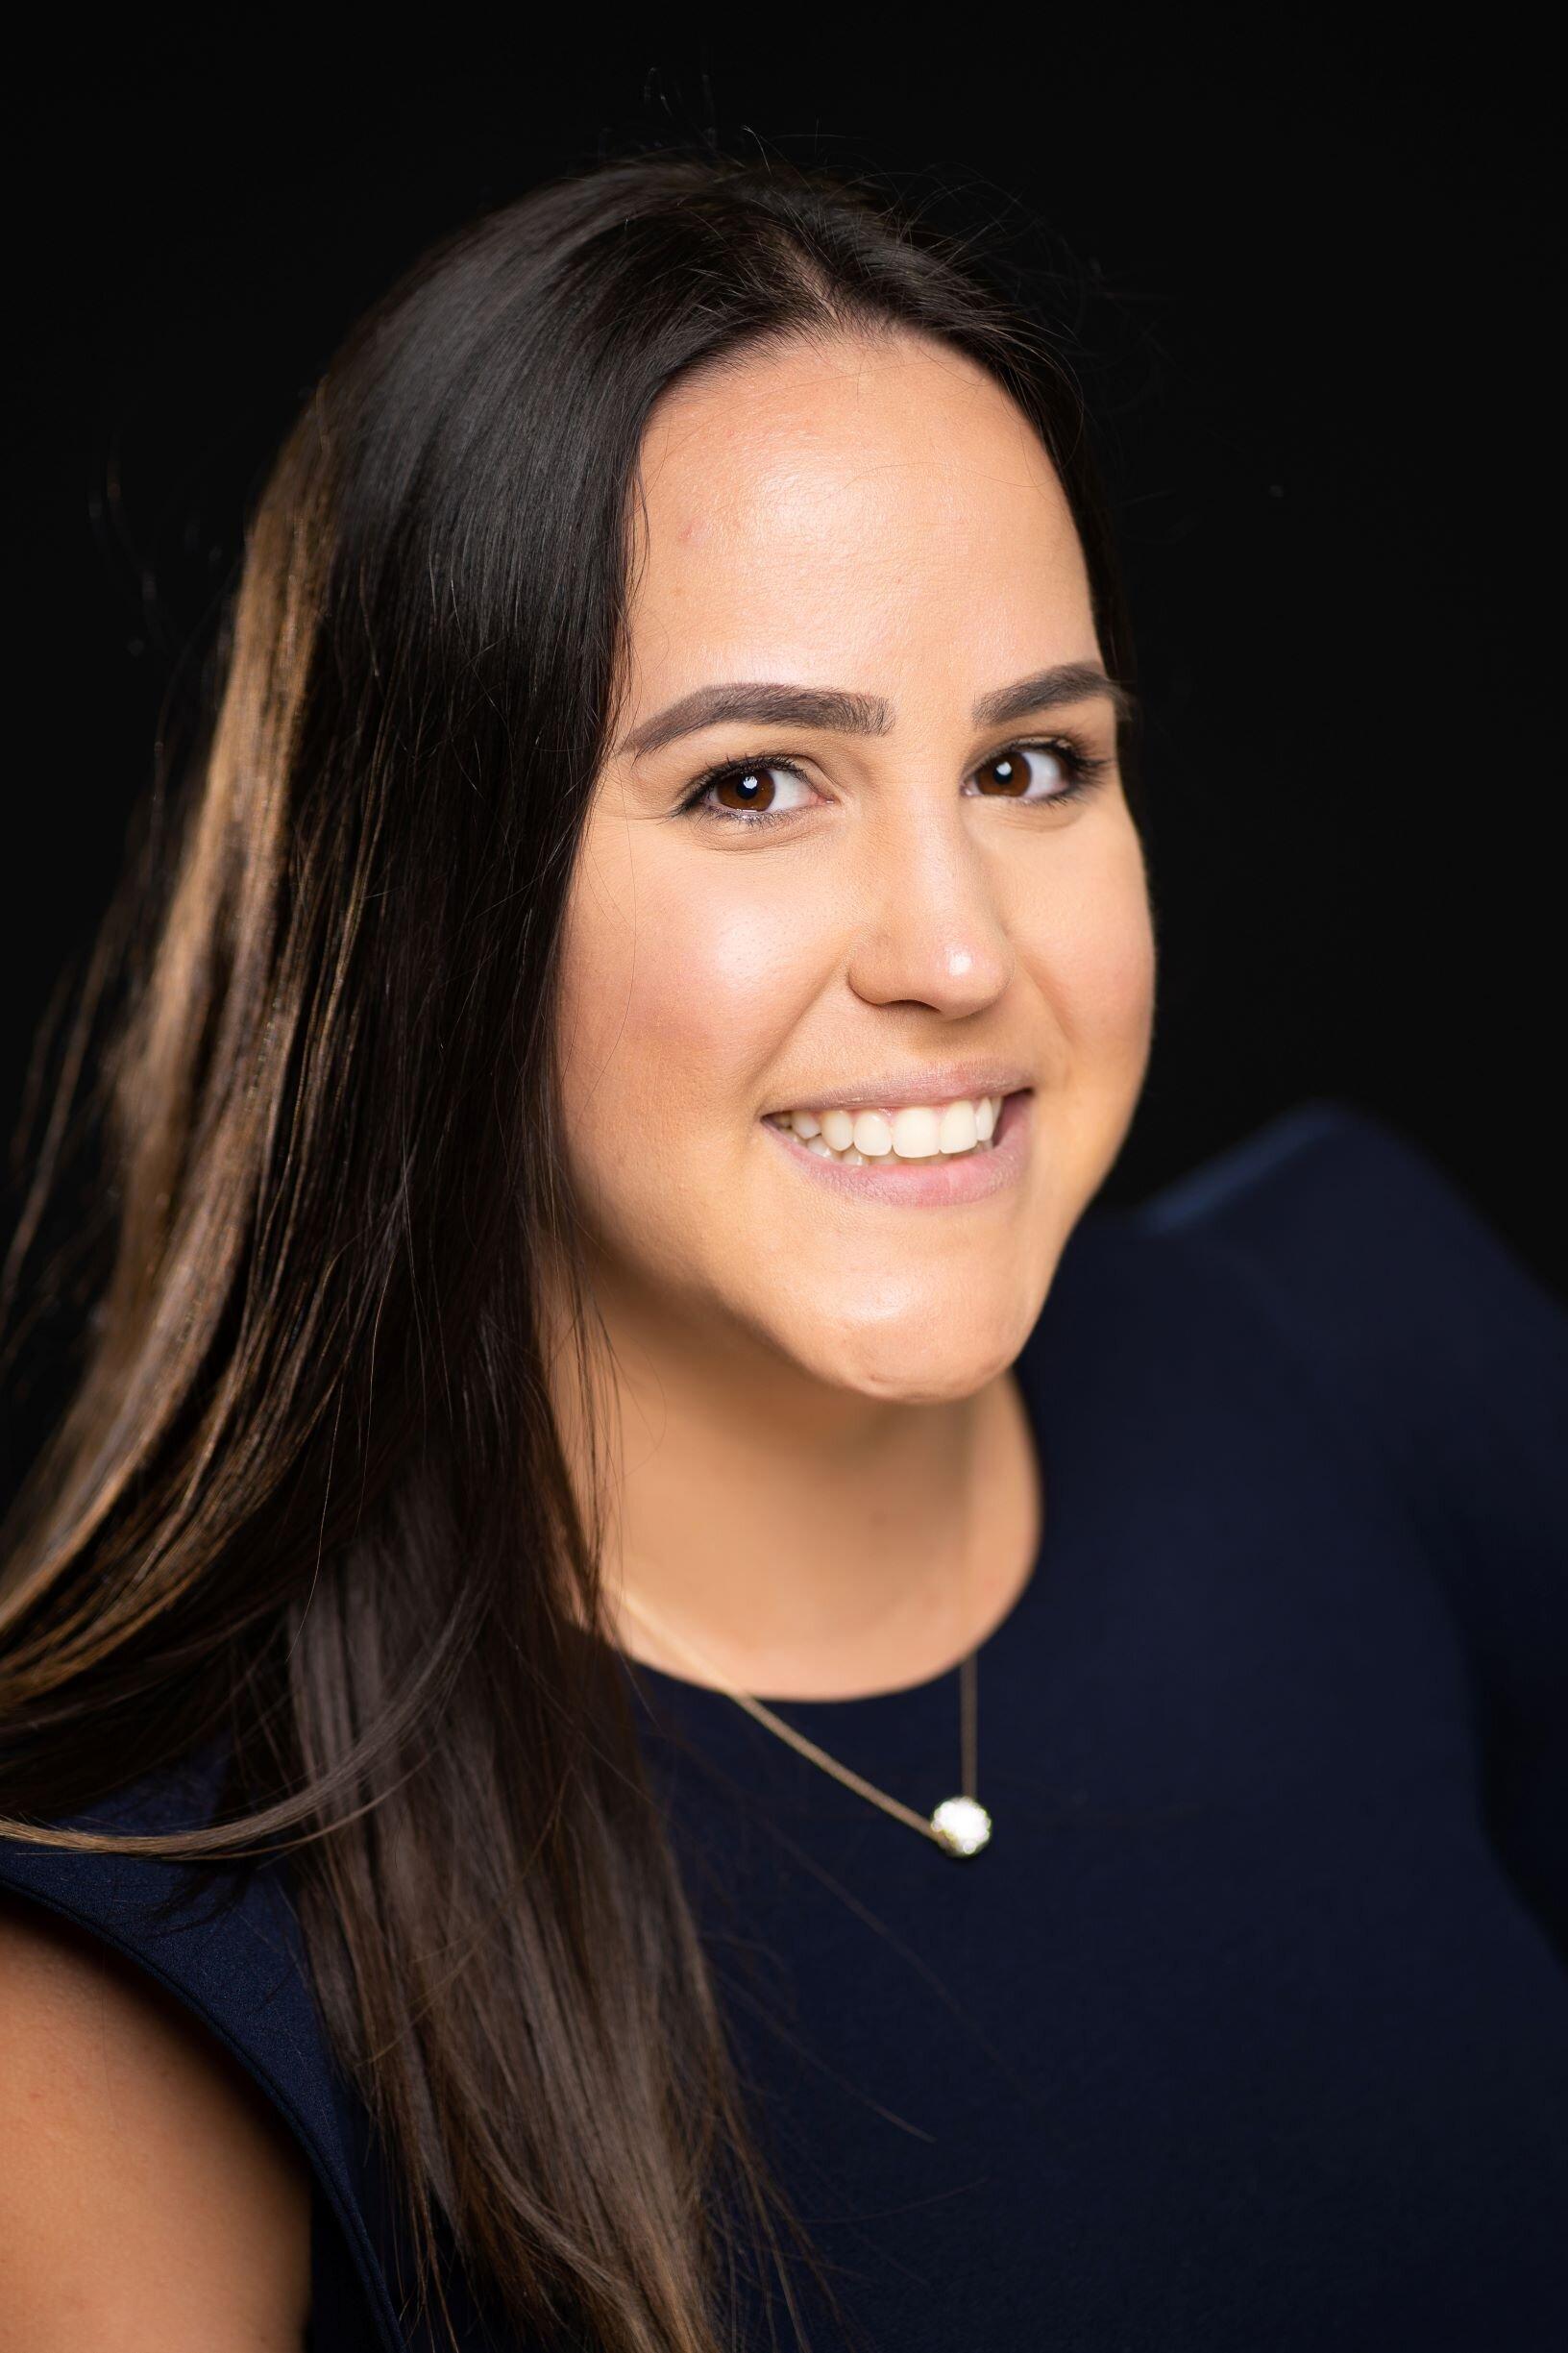 Claudia Cobreiro  Family Law, Real Estate, and Business Law Attorney   @claudiac_esq